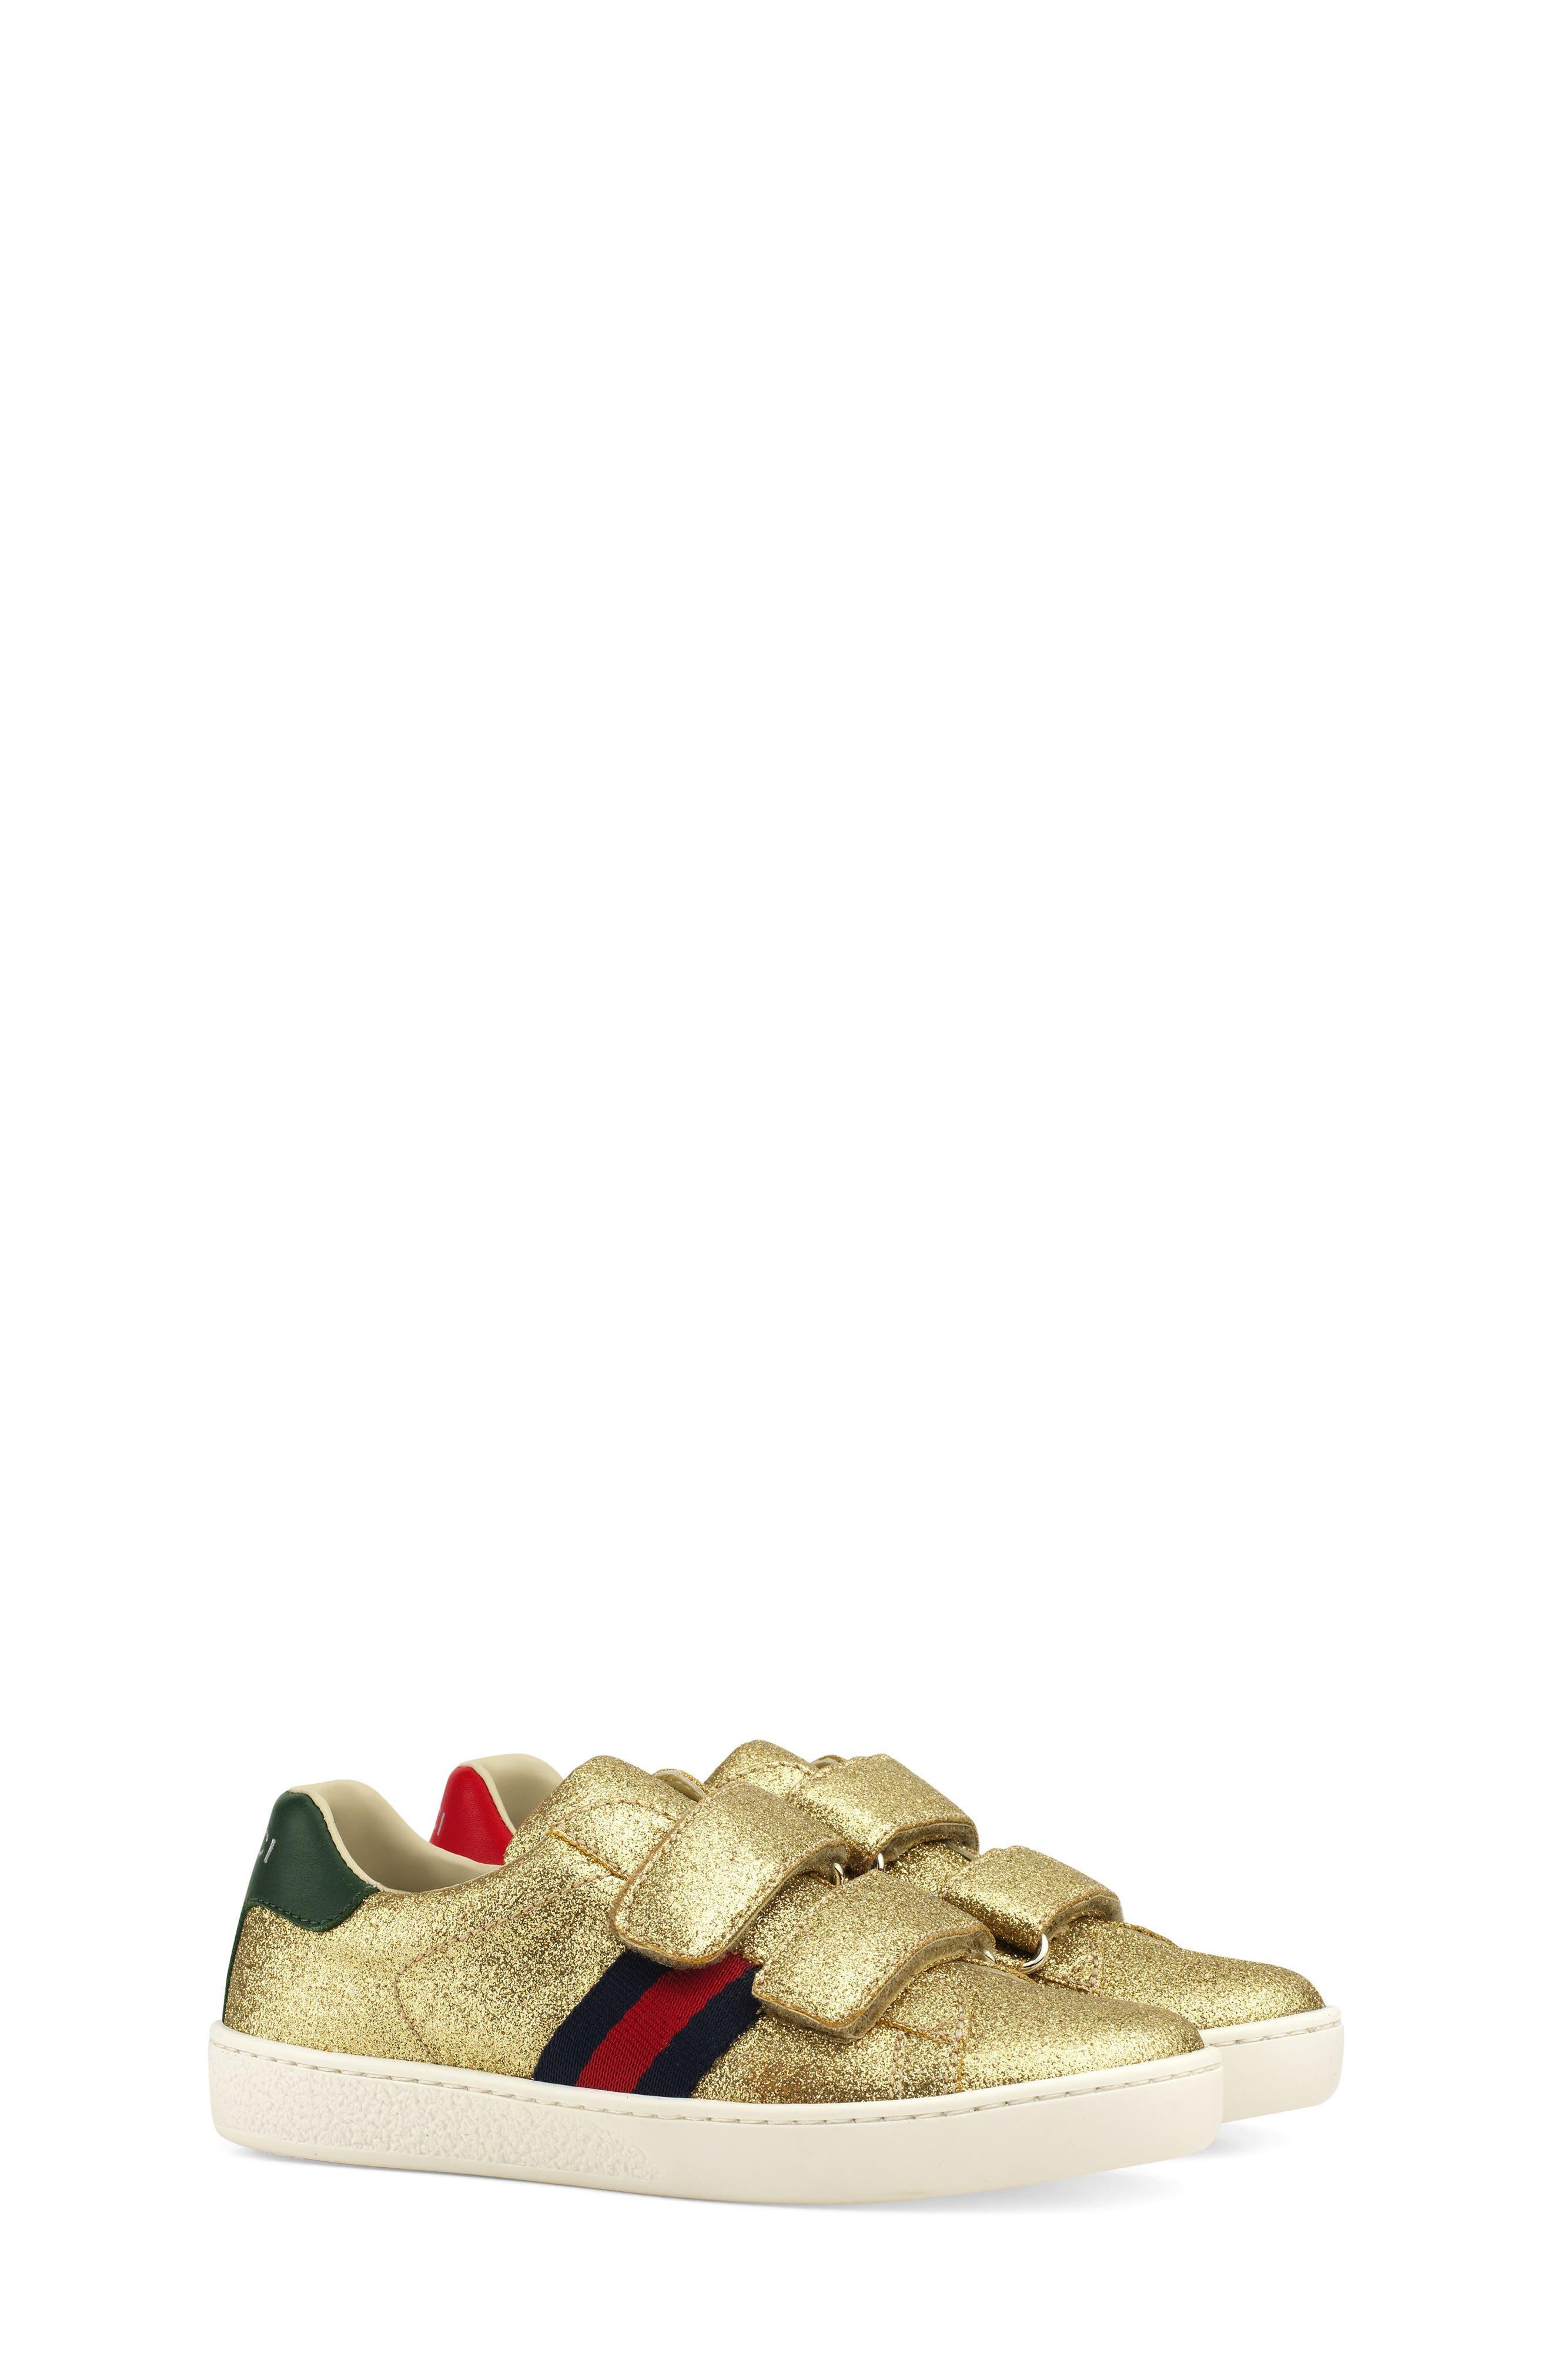 New Ace Sneaker,                             Main thumbnail 1, color,                             Metallic Gold